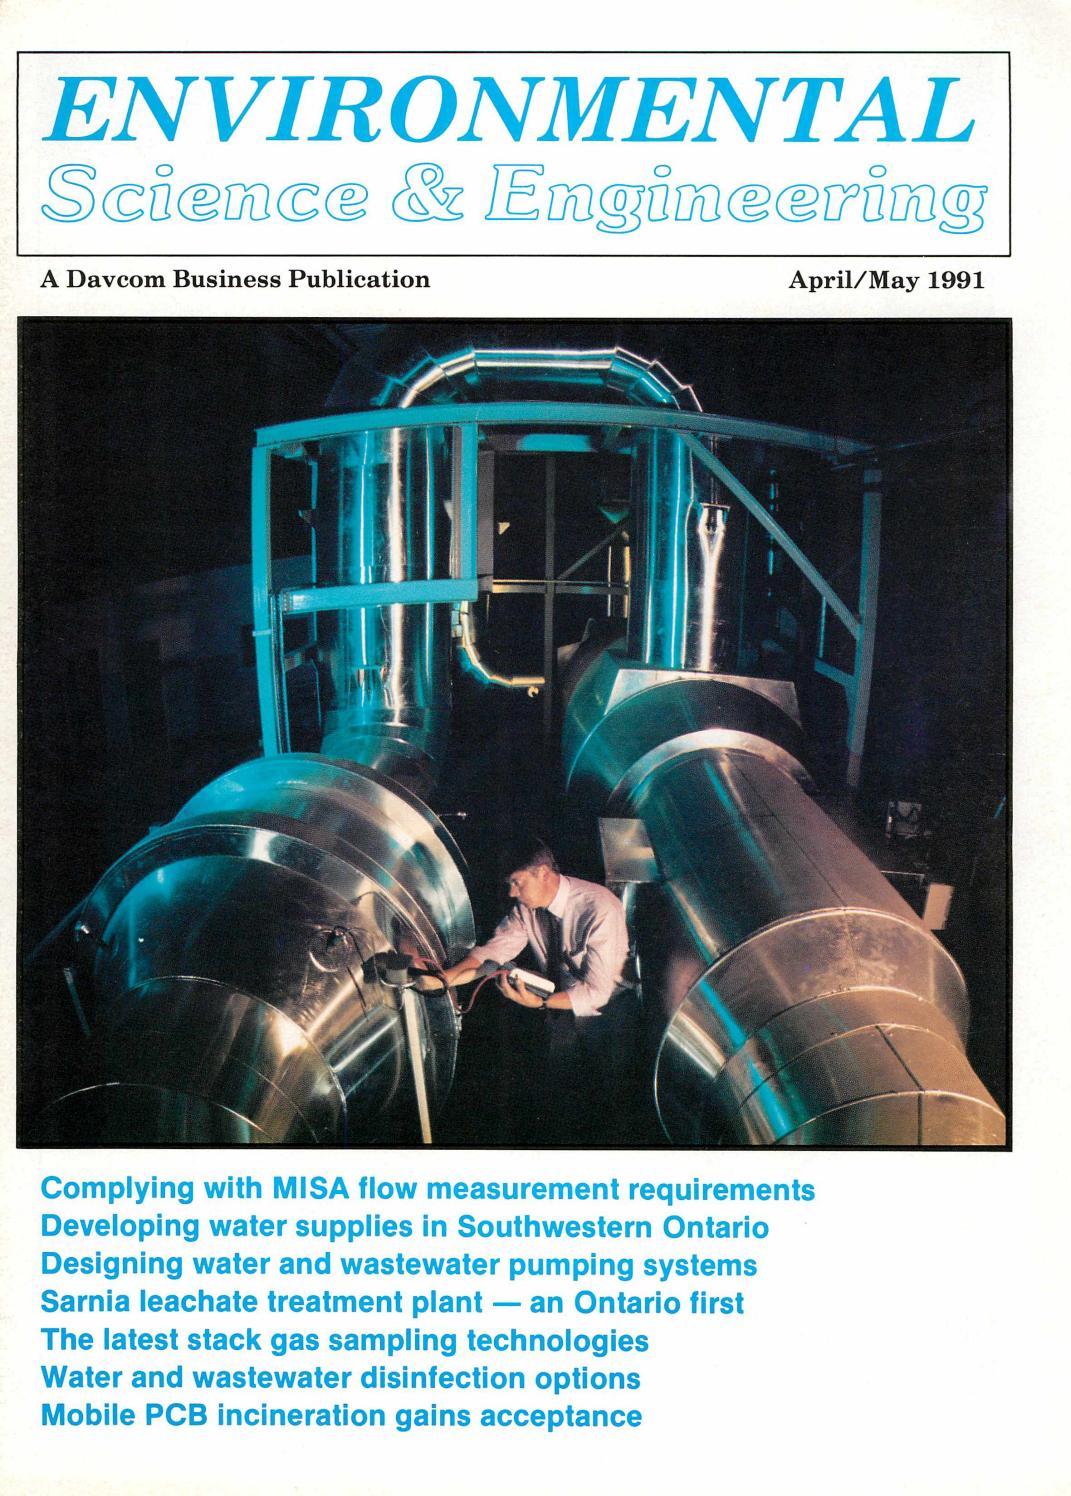 Environmental Science & Engineering Magazine (ESEMAG) April-May 1991 ...